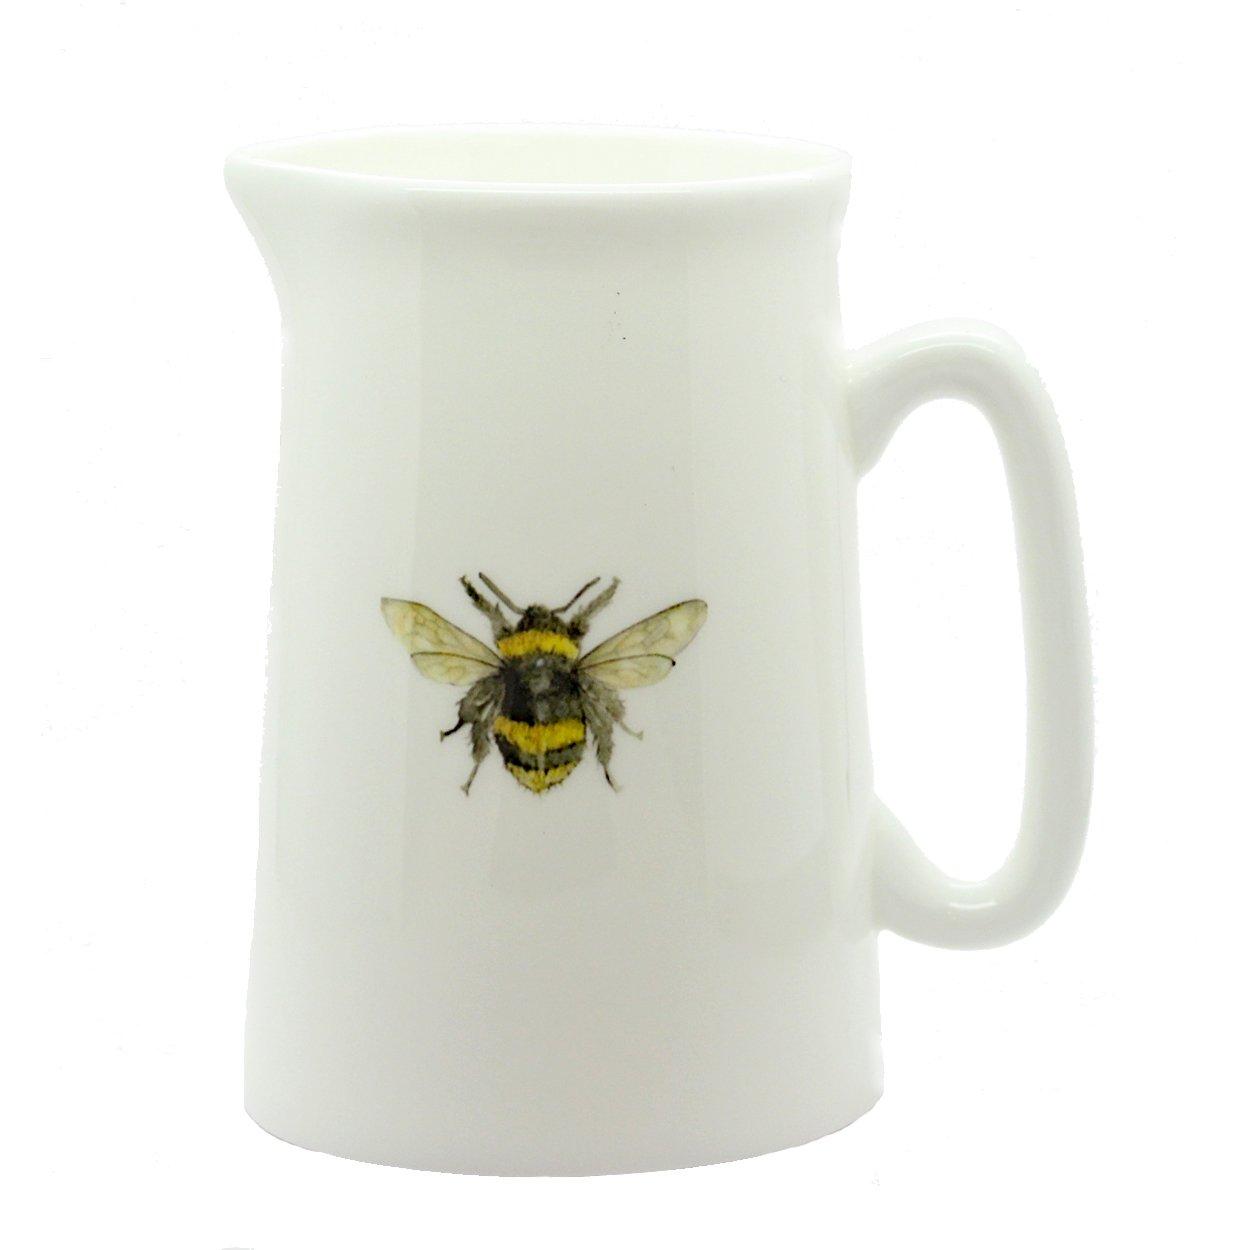 Bee Jug - Fine Bone China - Made in England The Skinny Card Company